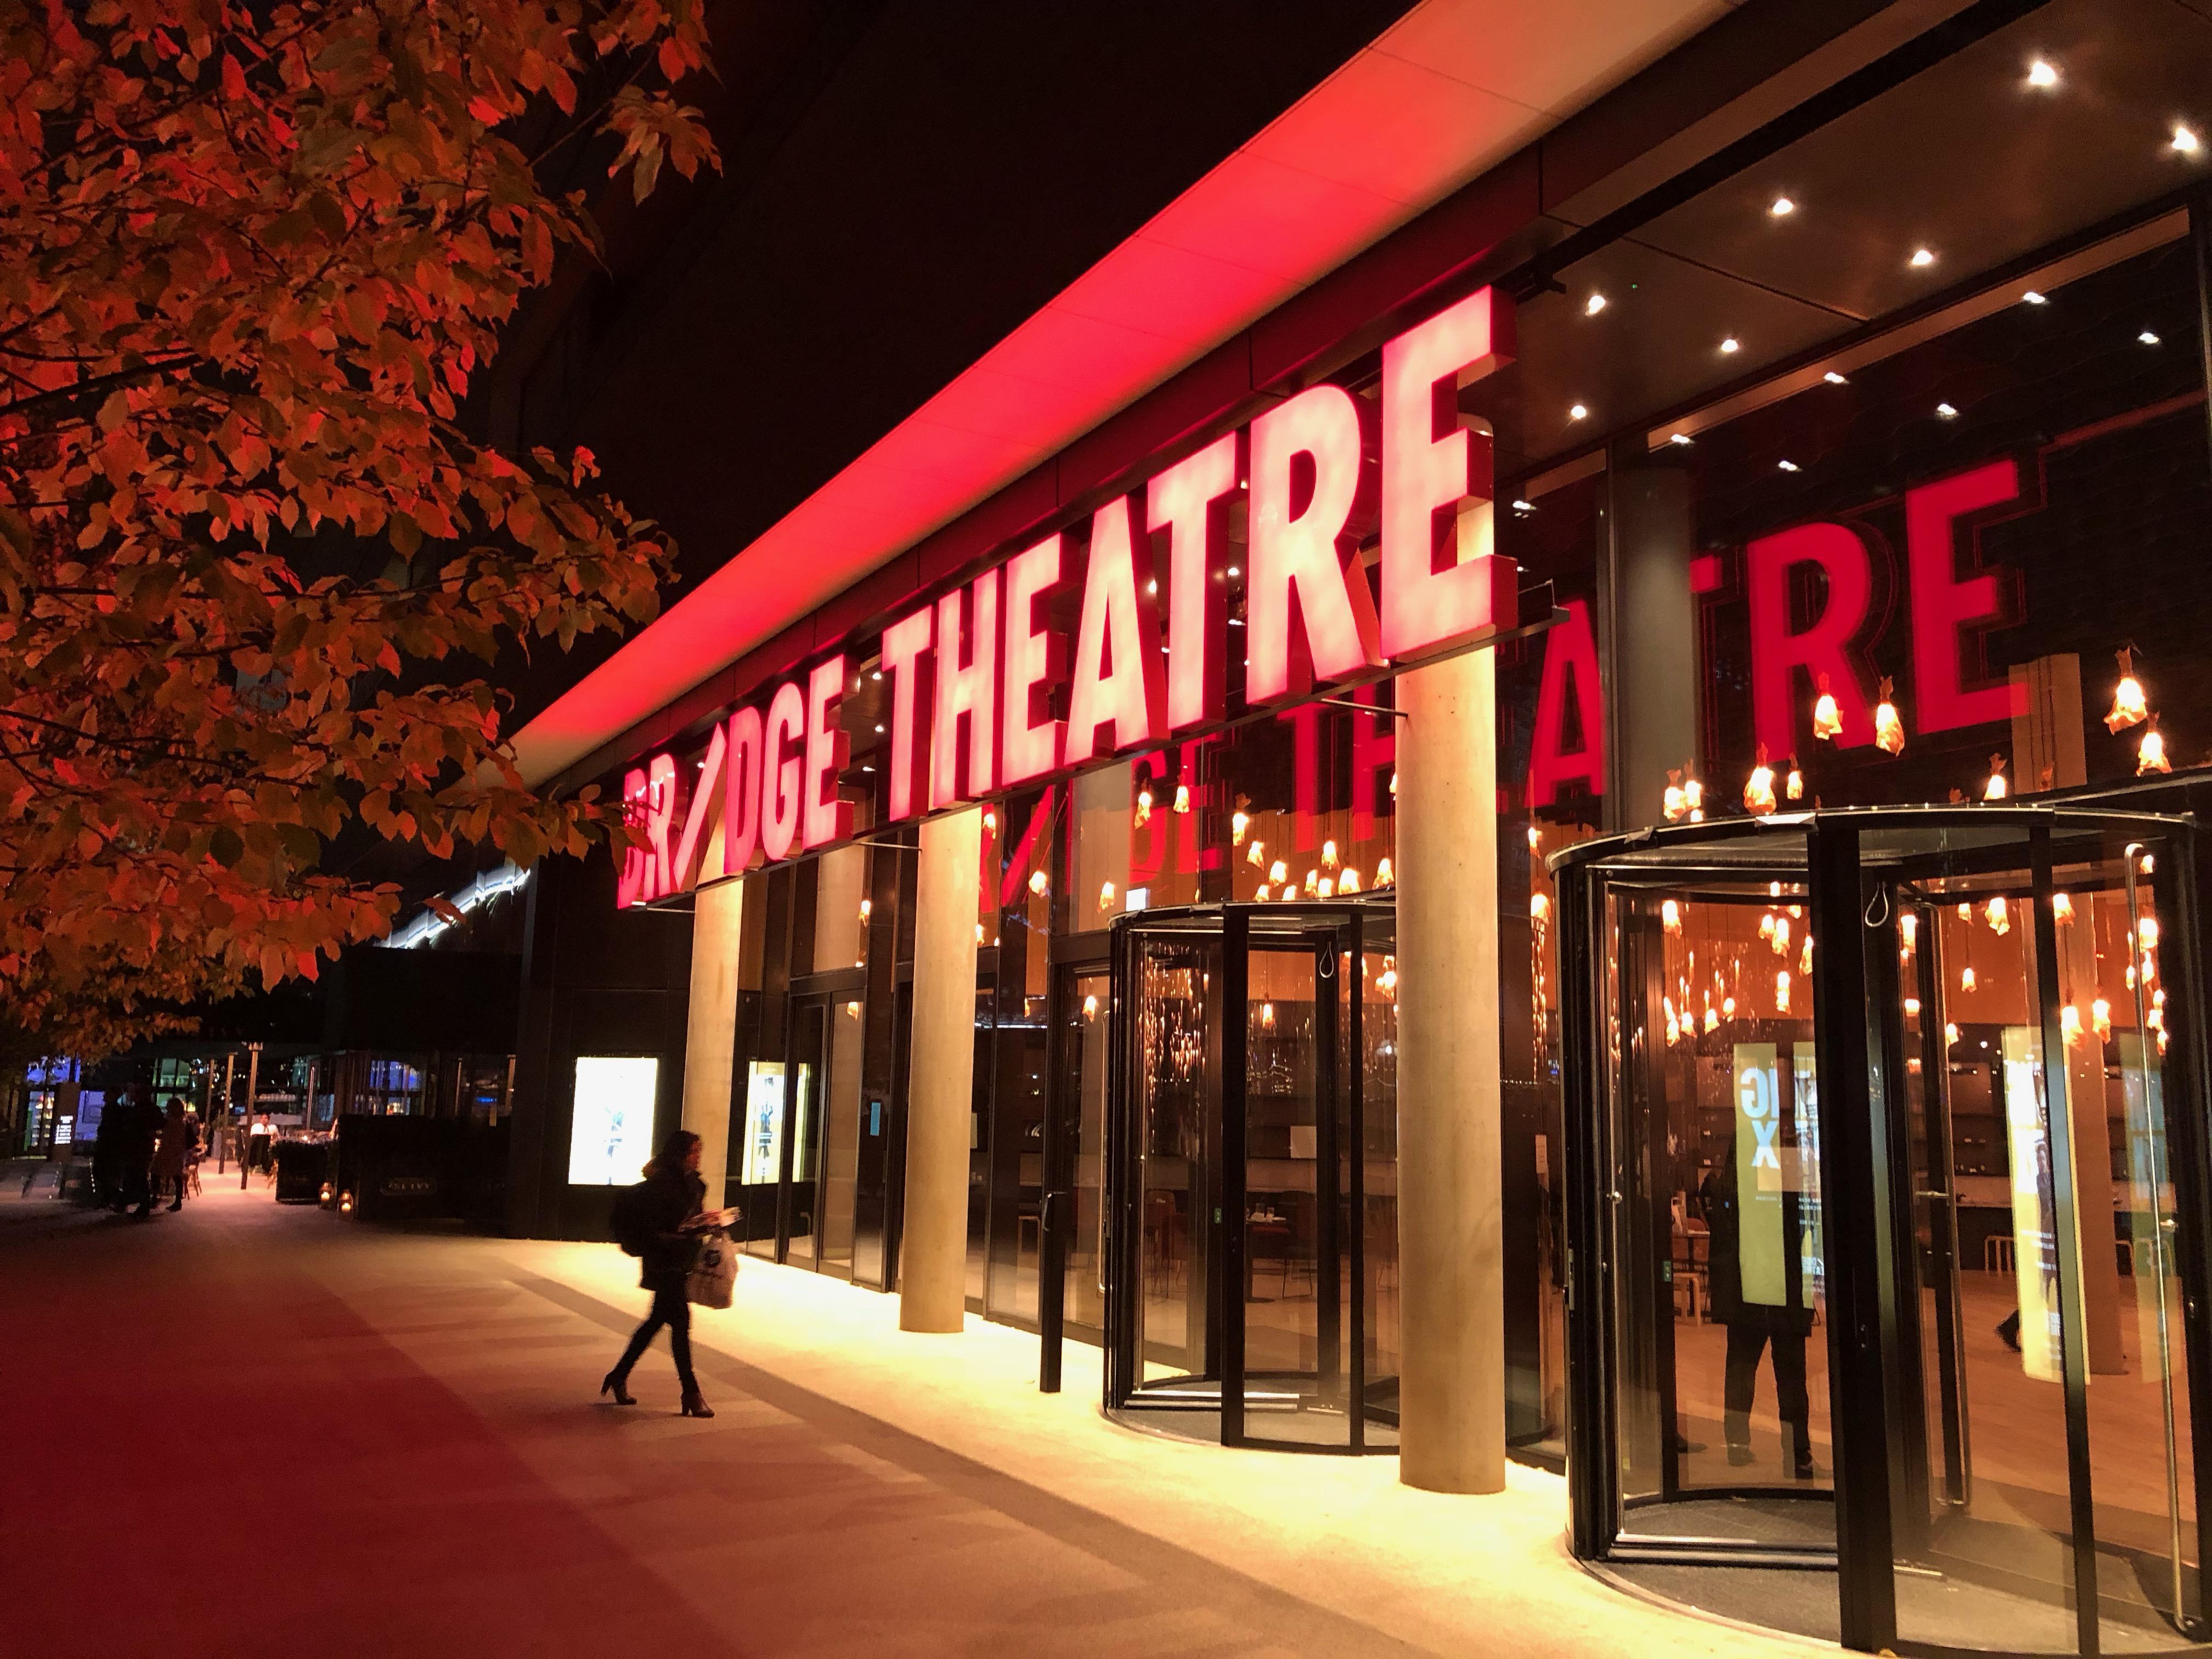 Photo of Bridge Theatre near Tower Bridge, London